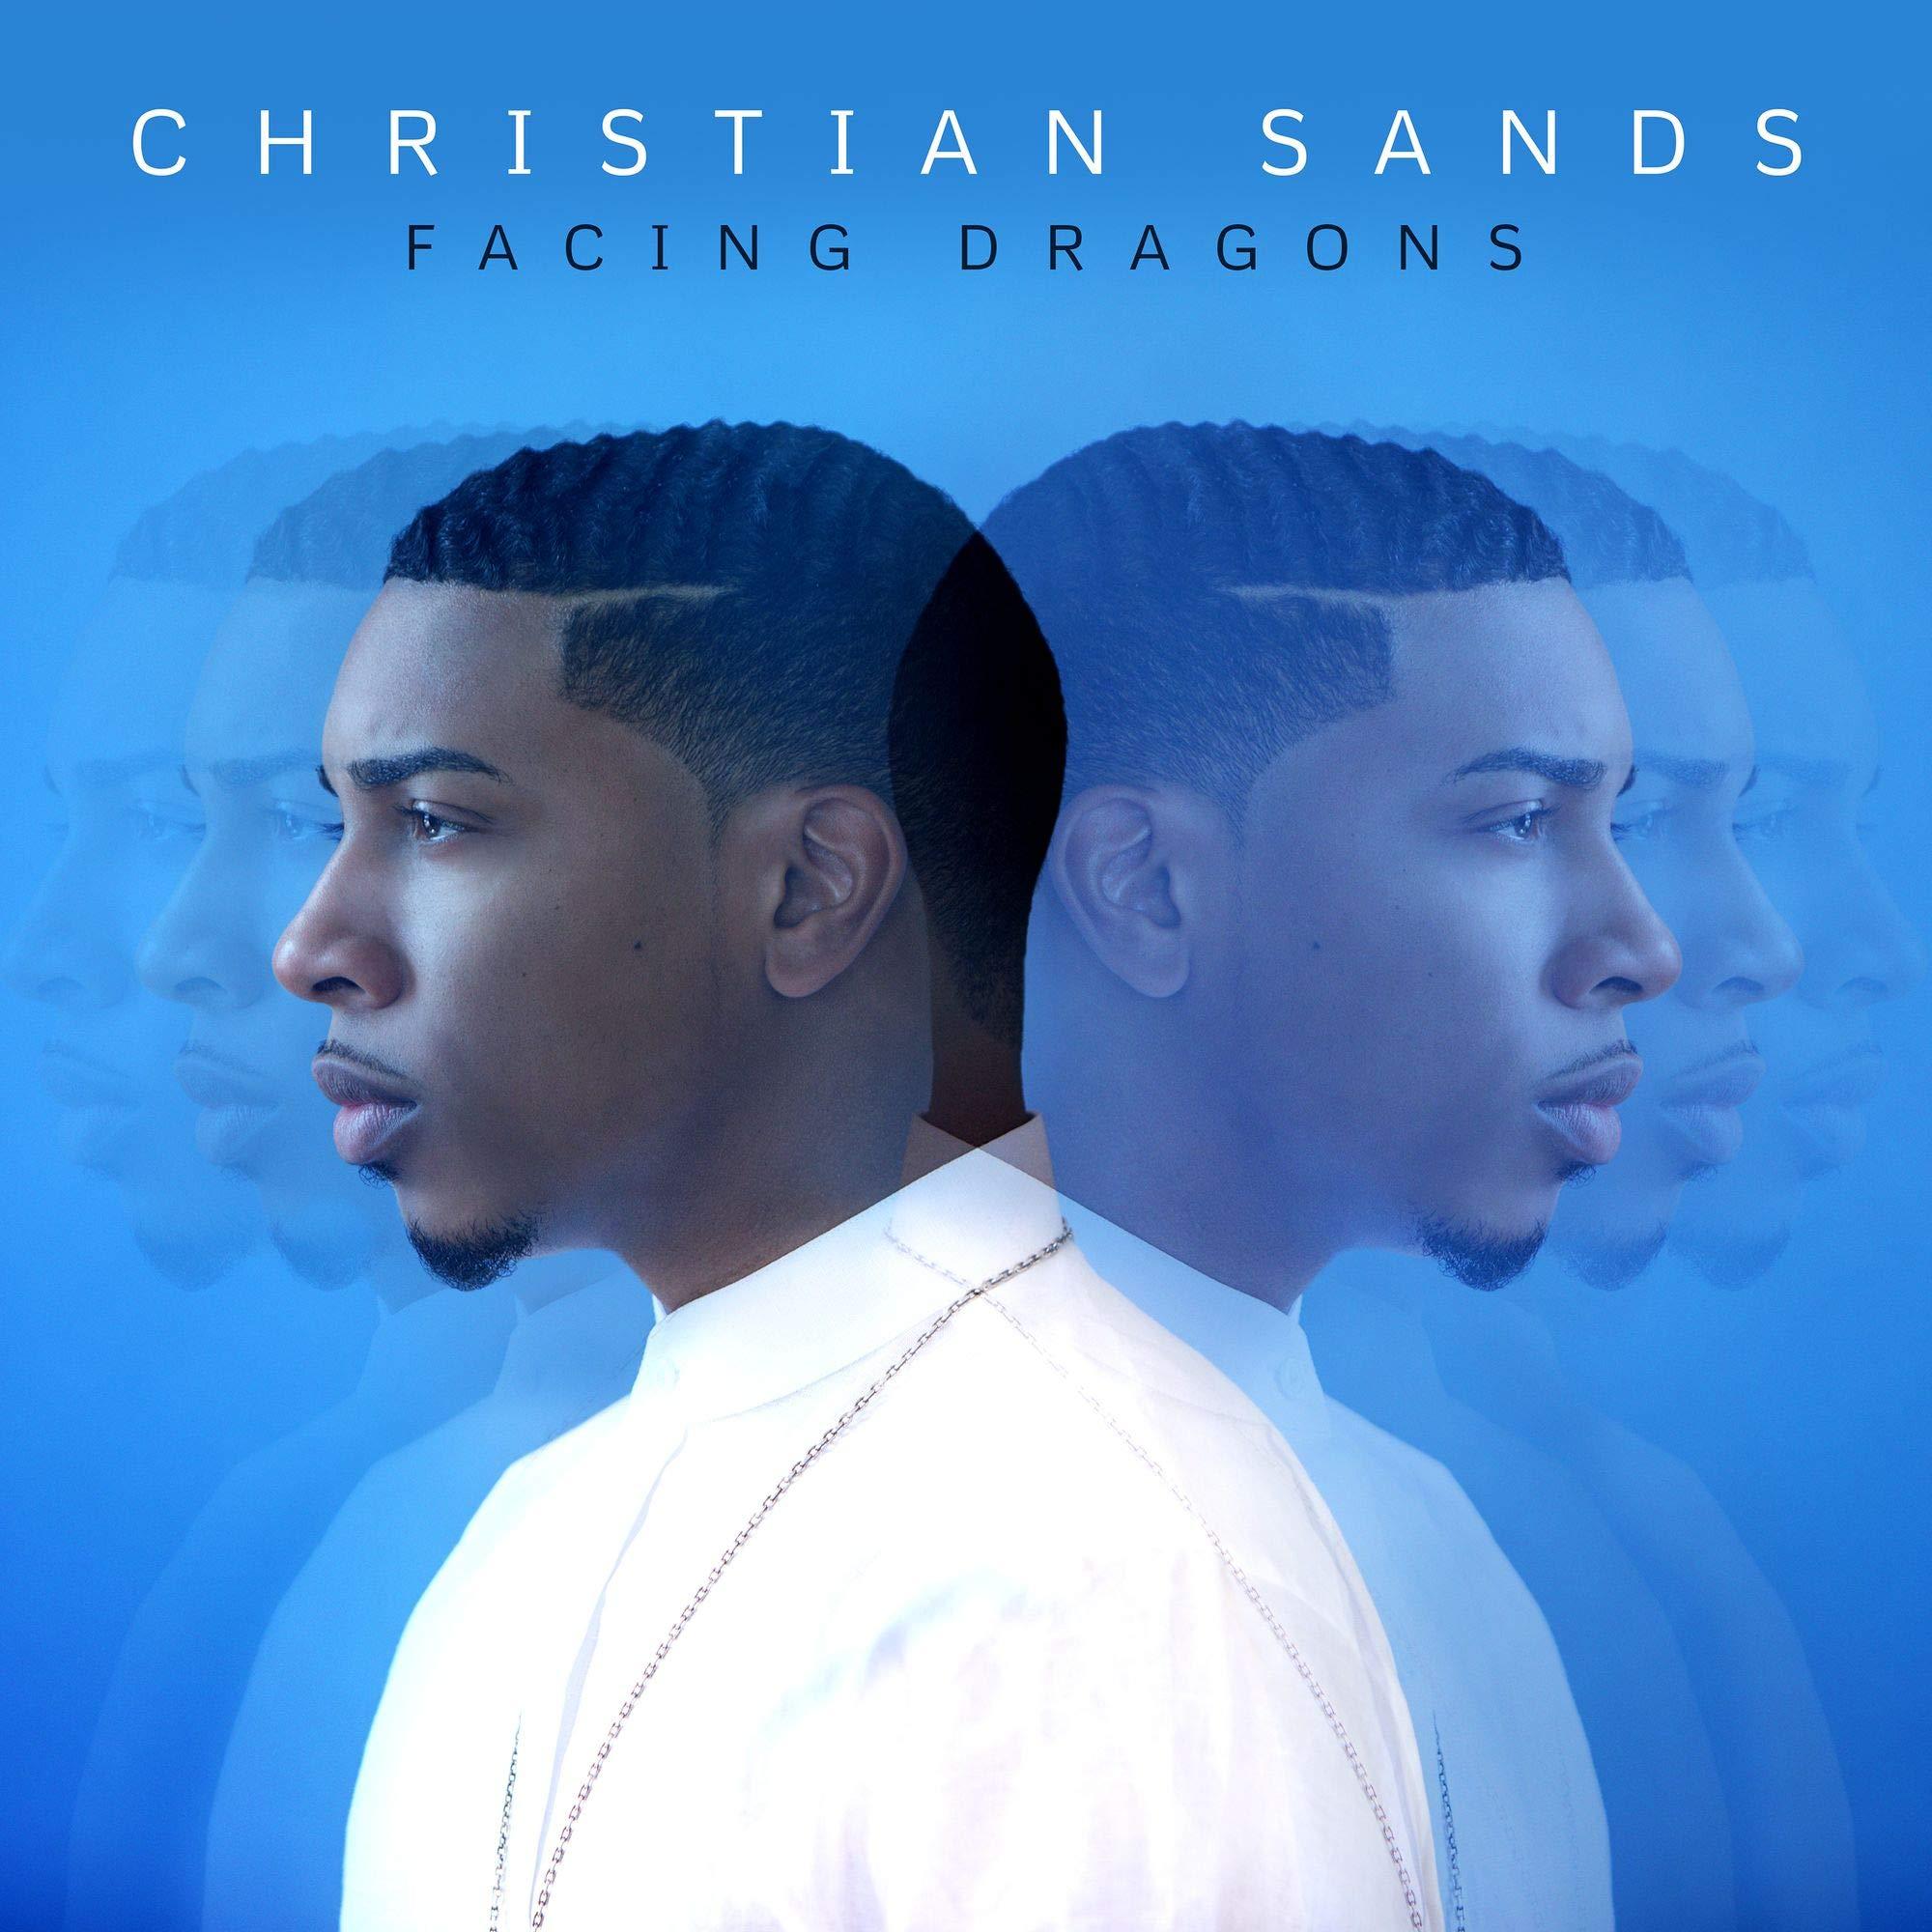 Vinilo : Christian Sands - Facing Dragons (LP Vinyl)